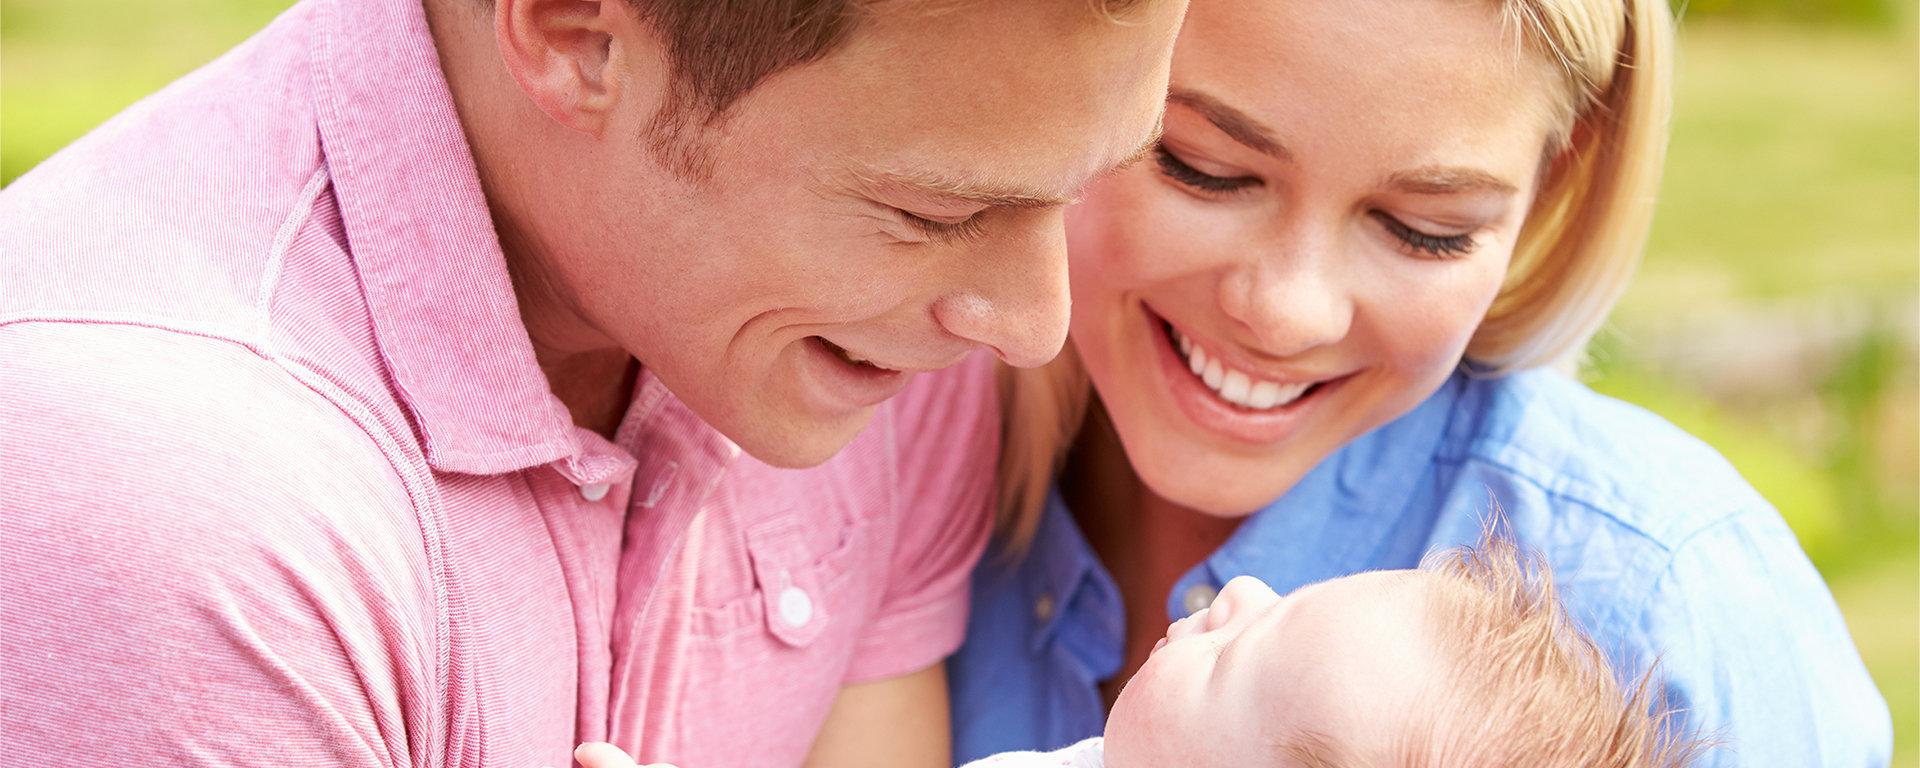 Family-and-baby-FILEminimizer